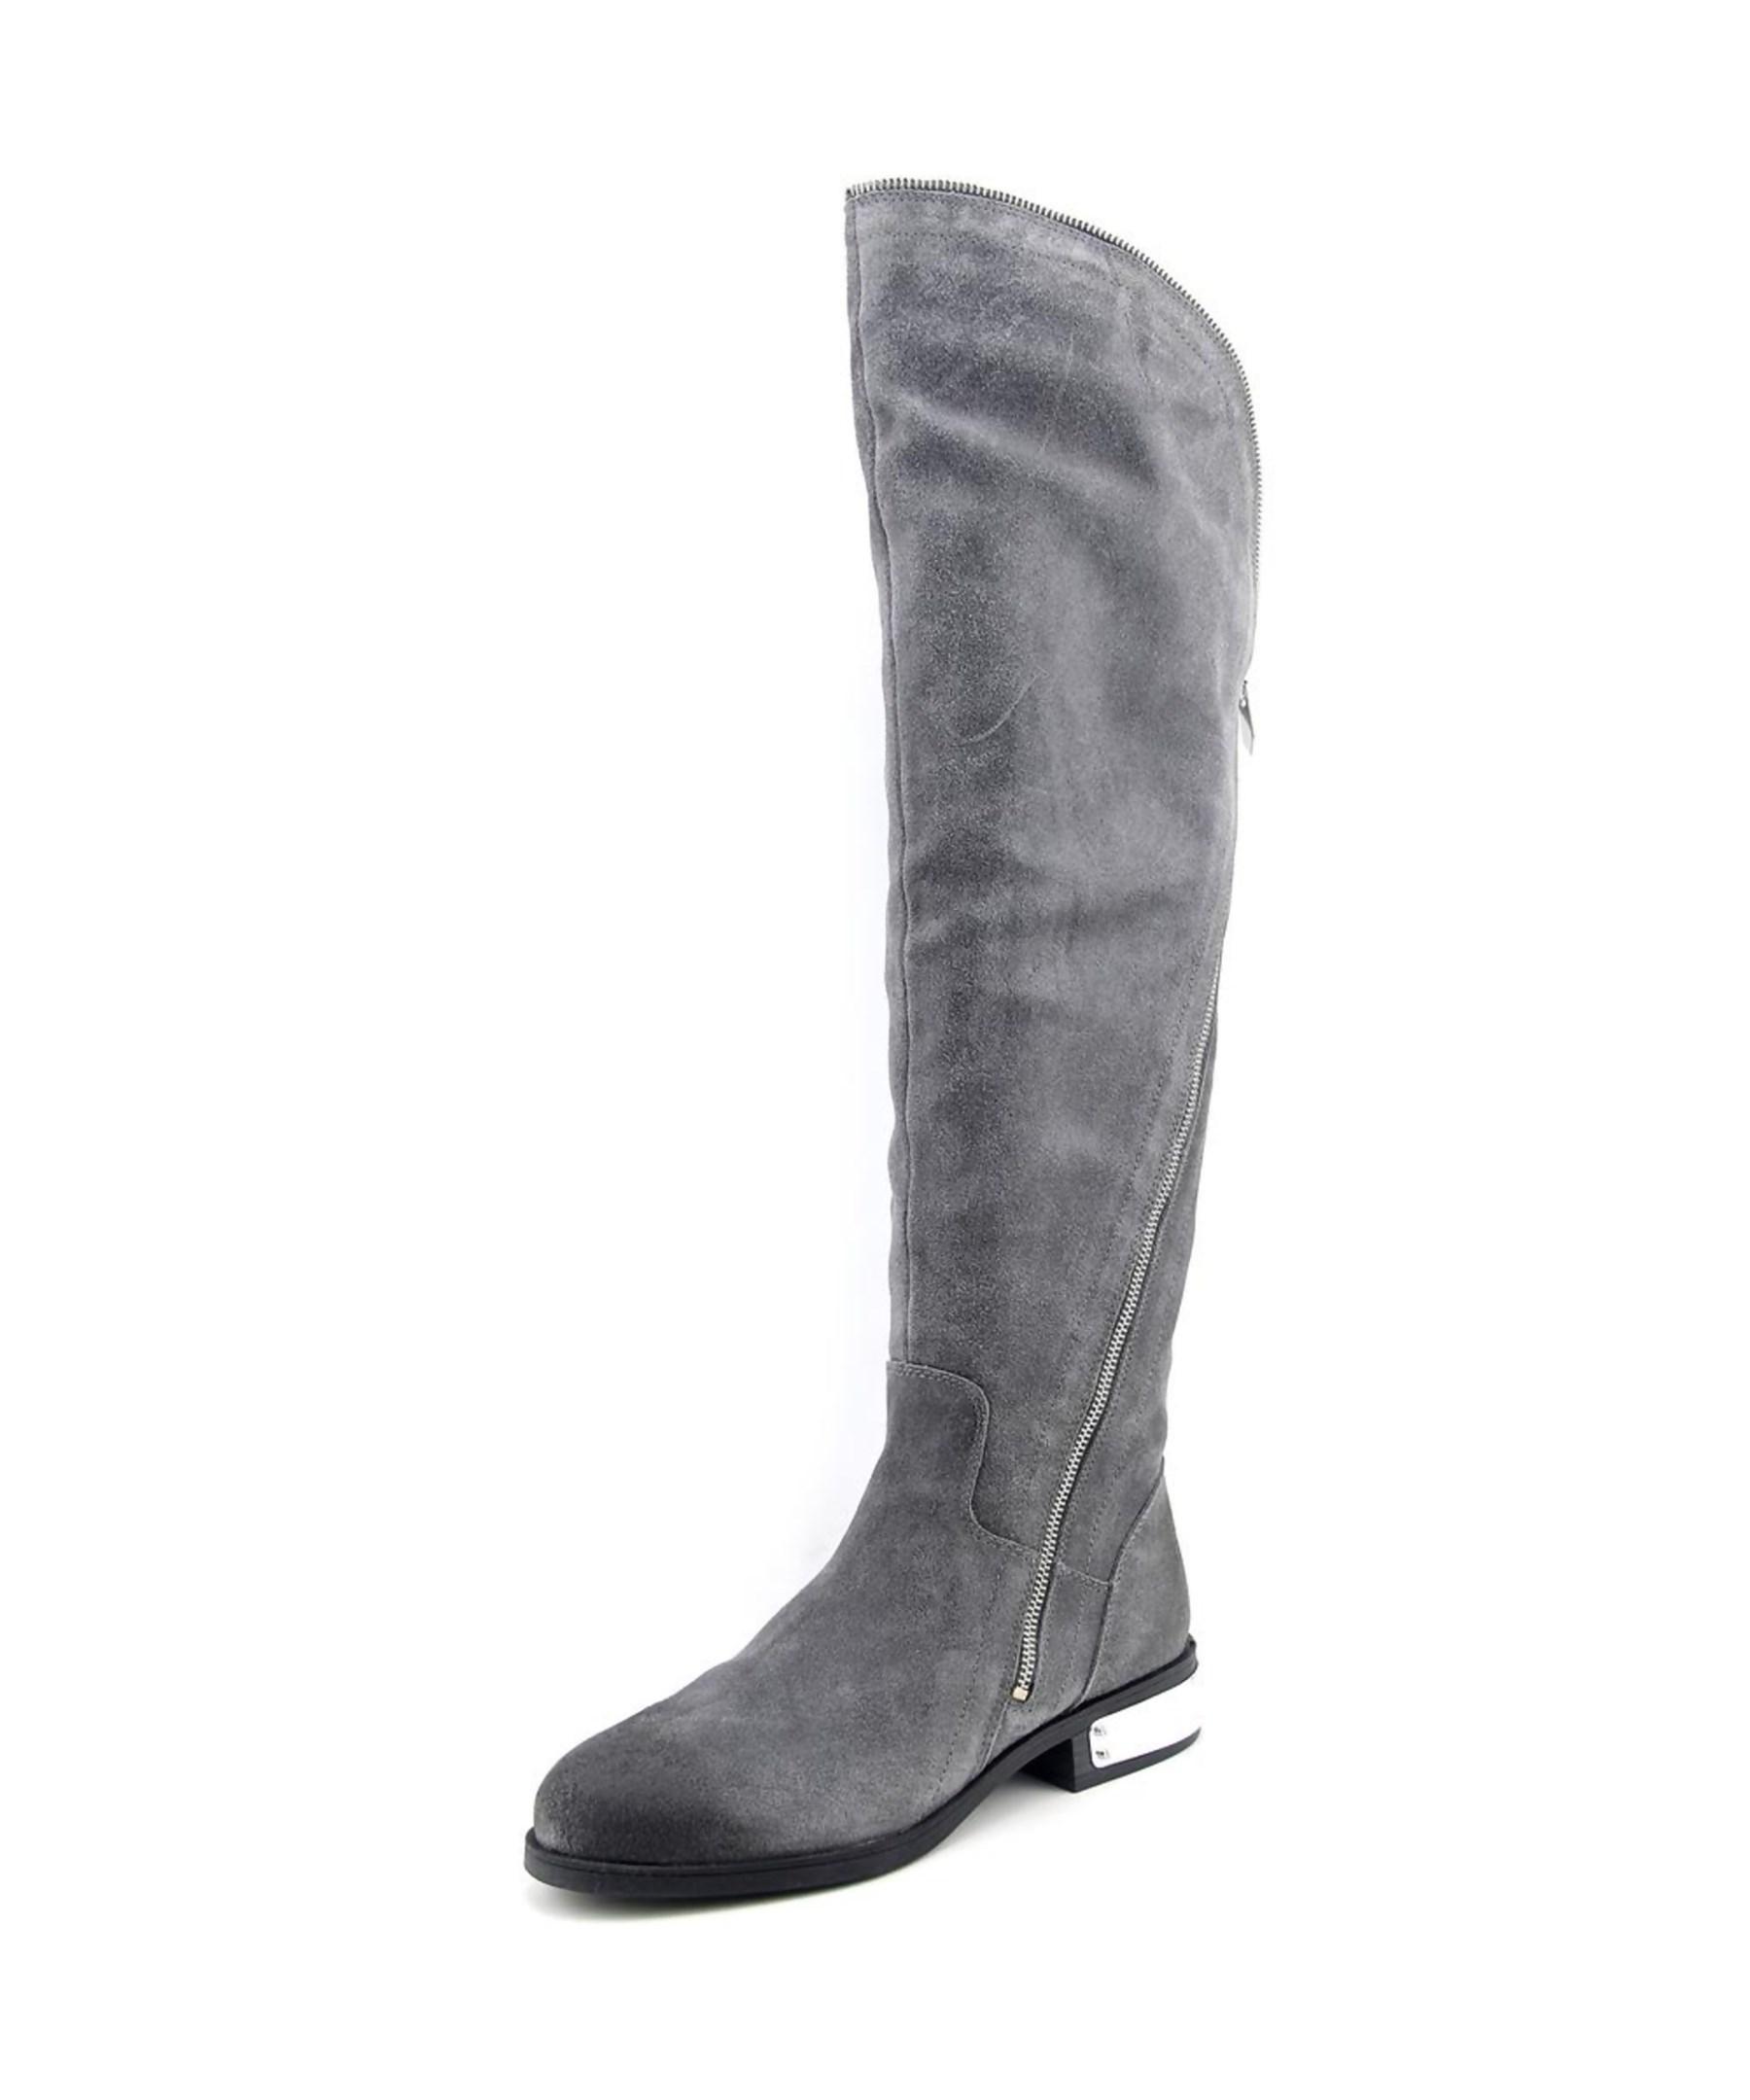 fergie navaro toe suede the knee boot in